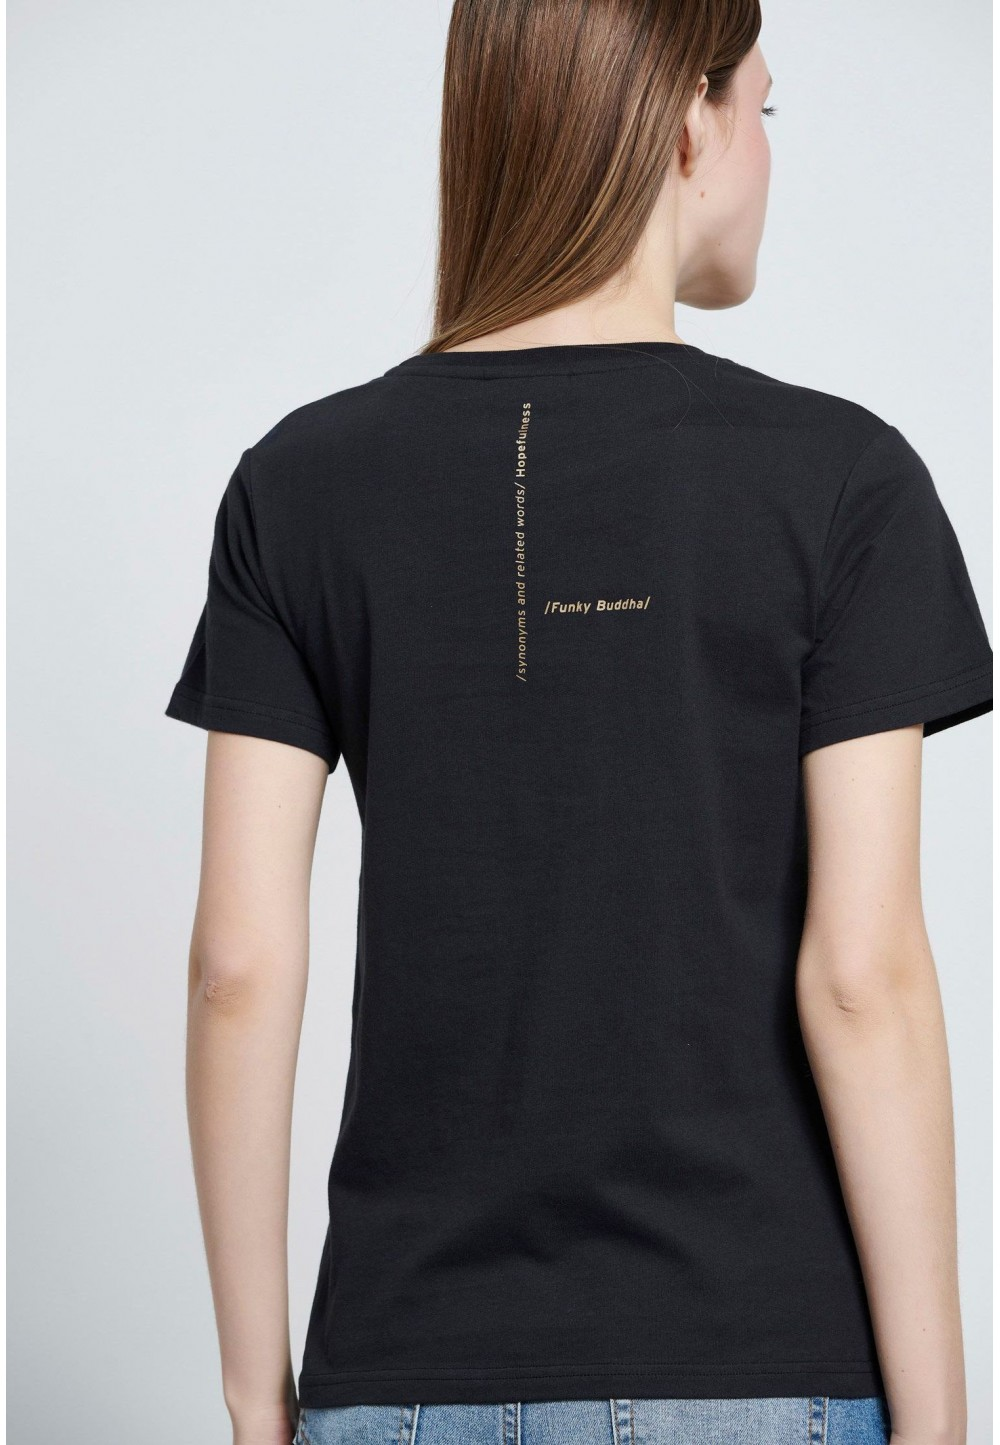 Чорна футболка з текстовим принтом